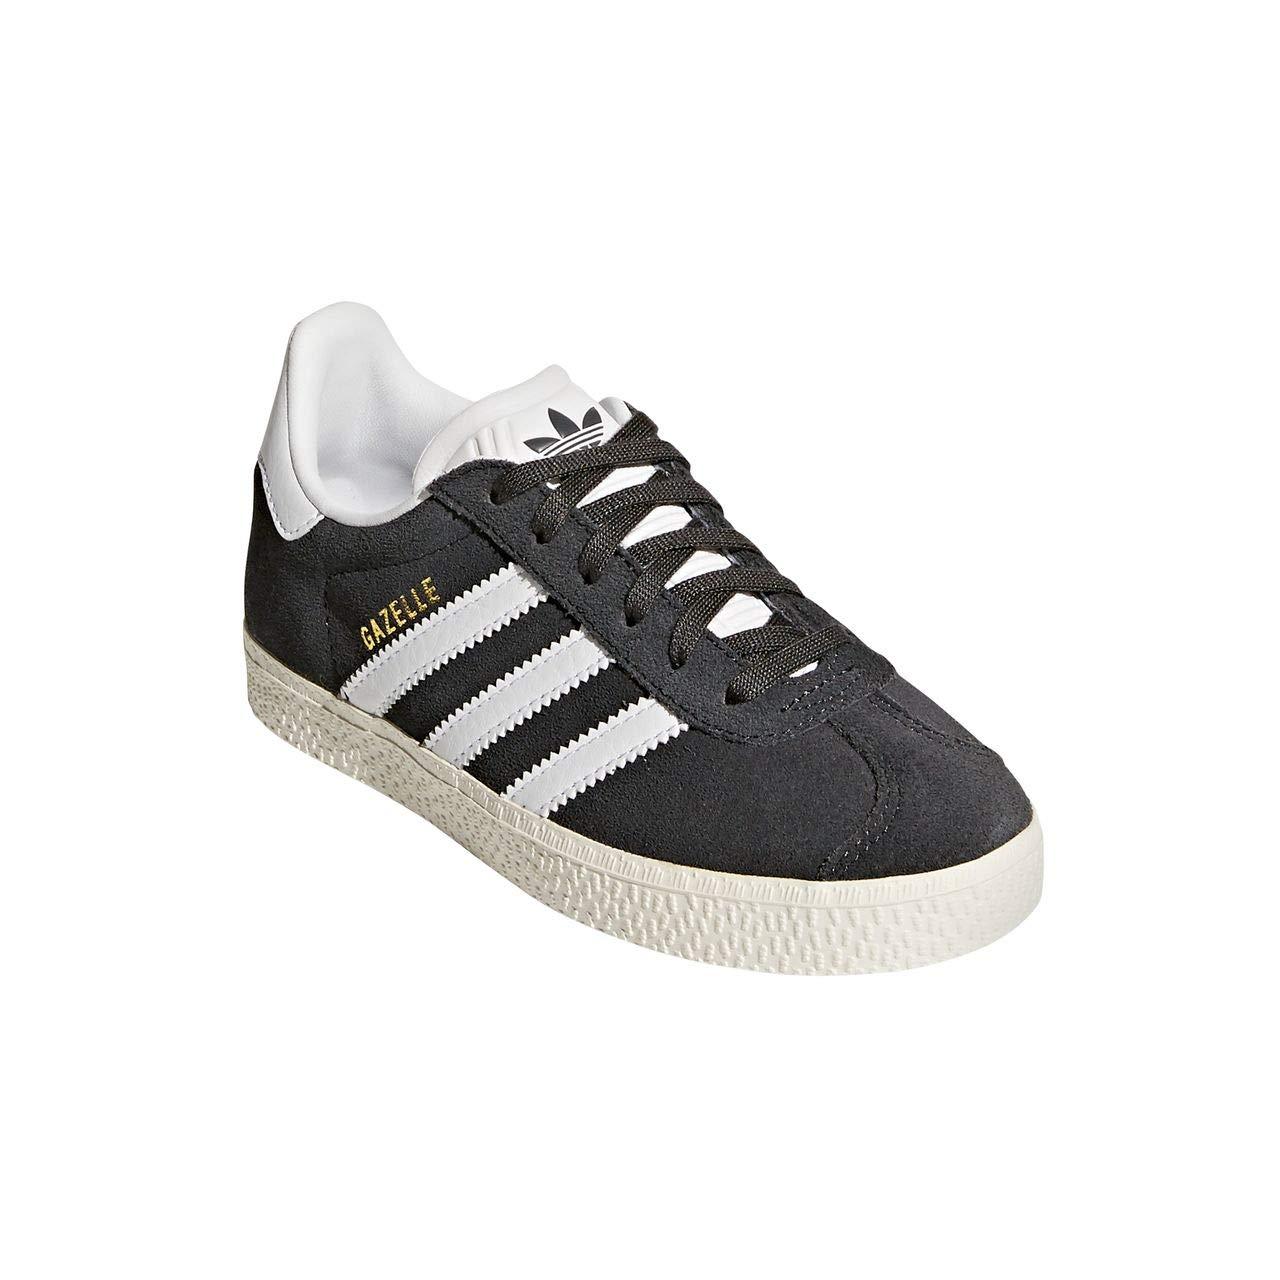 adidas Unisex-Kinder Gazelle Sneaker Schwarz 36 EU